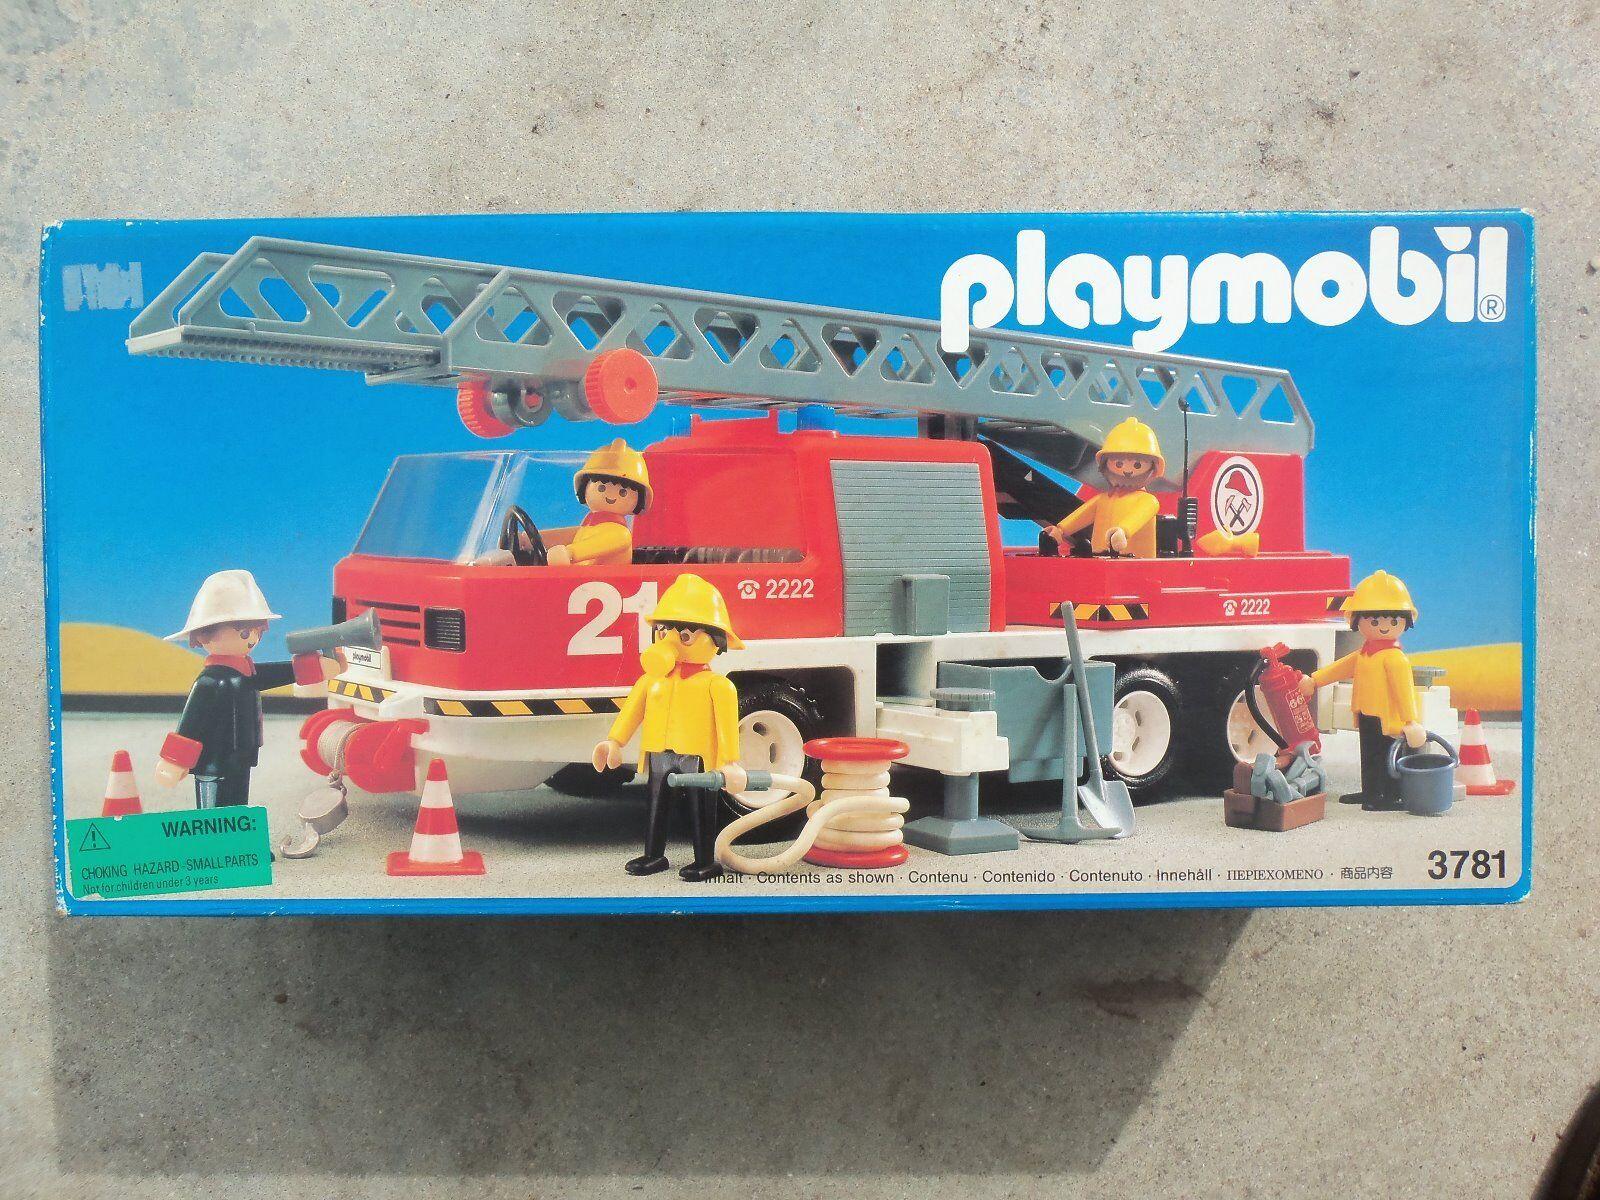 Playmobill Fire Engine #3781 Rare Collectors Item 1992 Unopened Original Box.